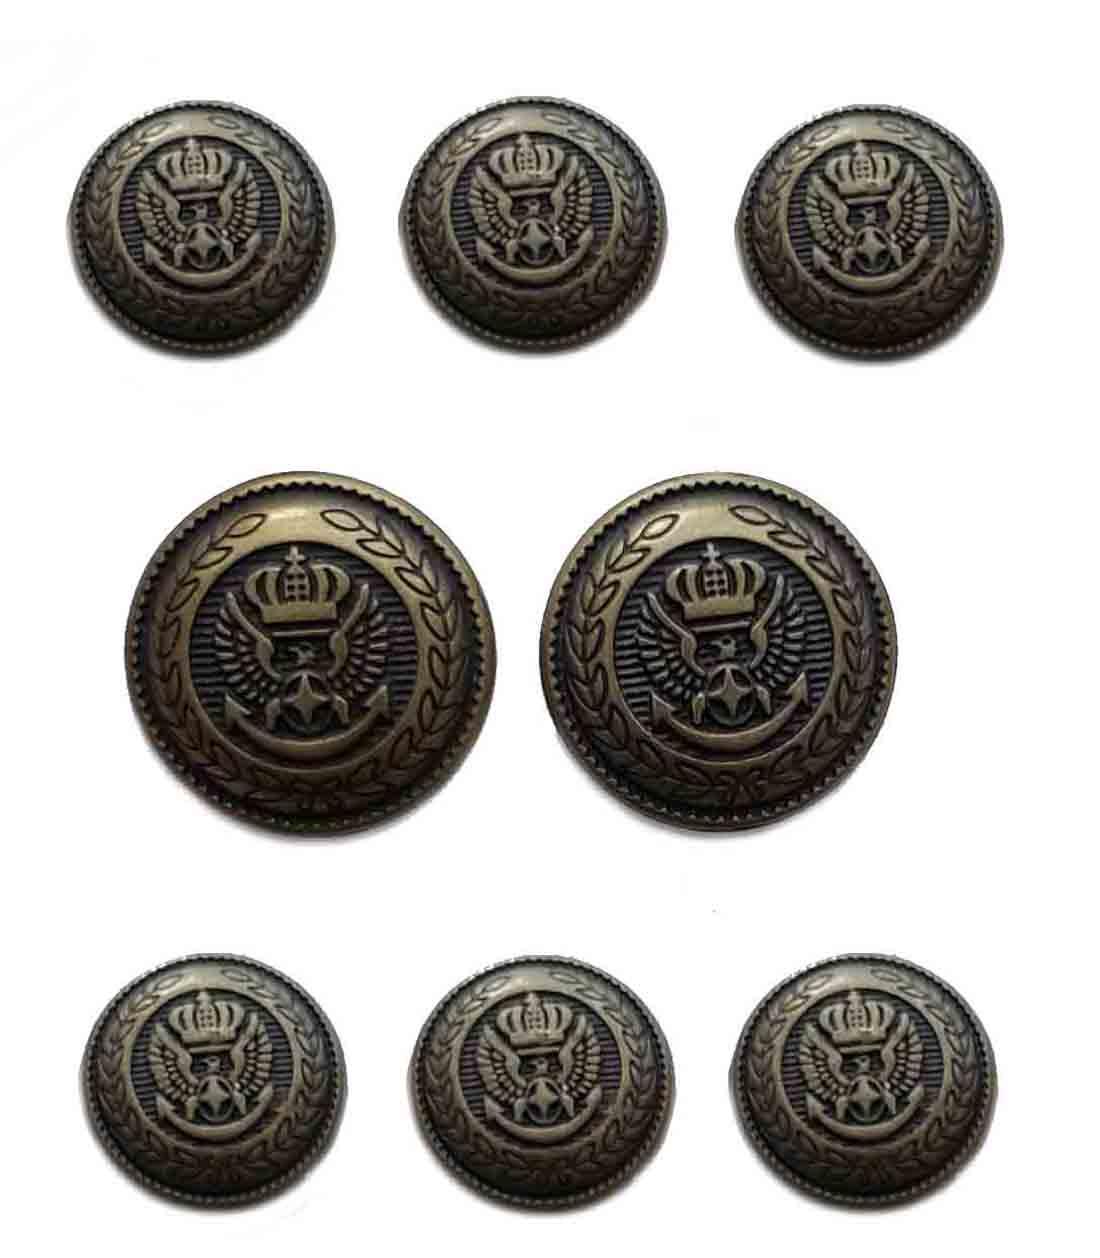 Vintage Meeting Street Brass Buttons Set Gold Brown Eagle Anchor Crown Brass Men's